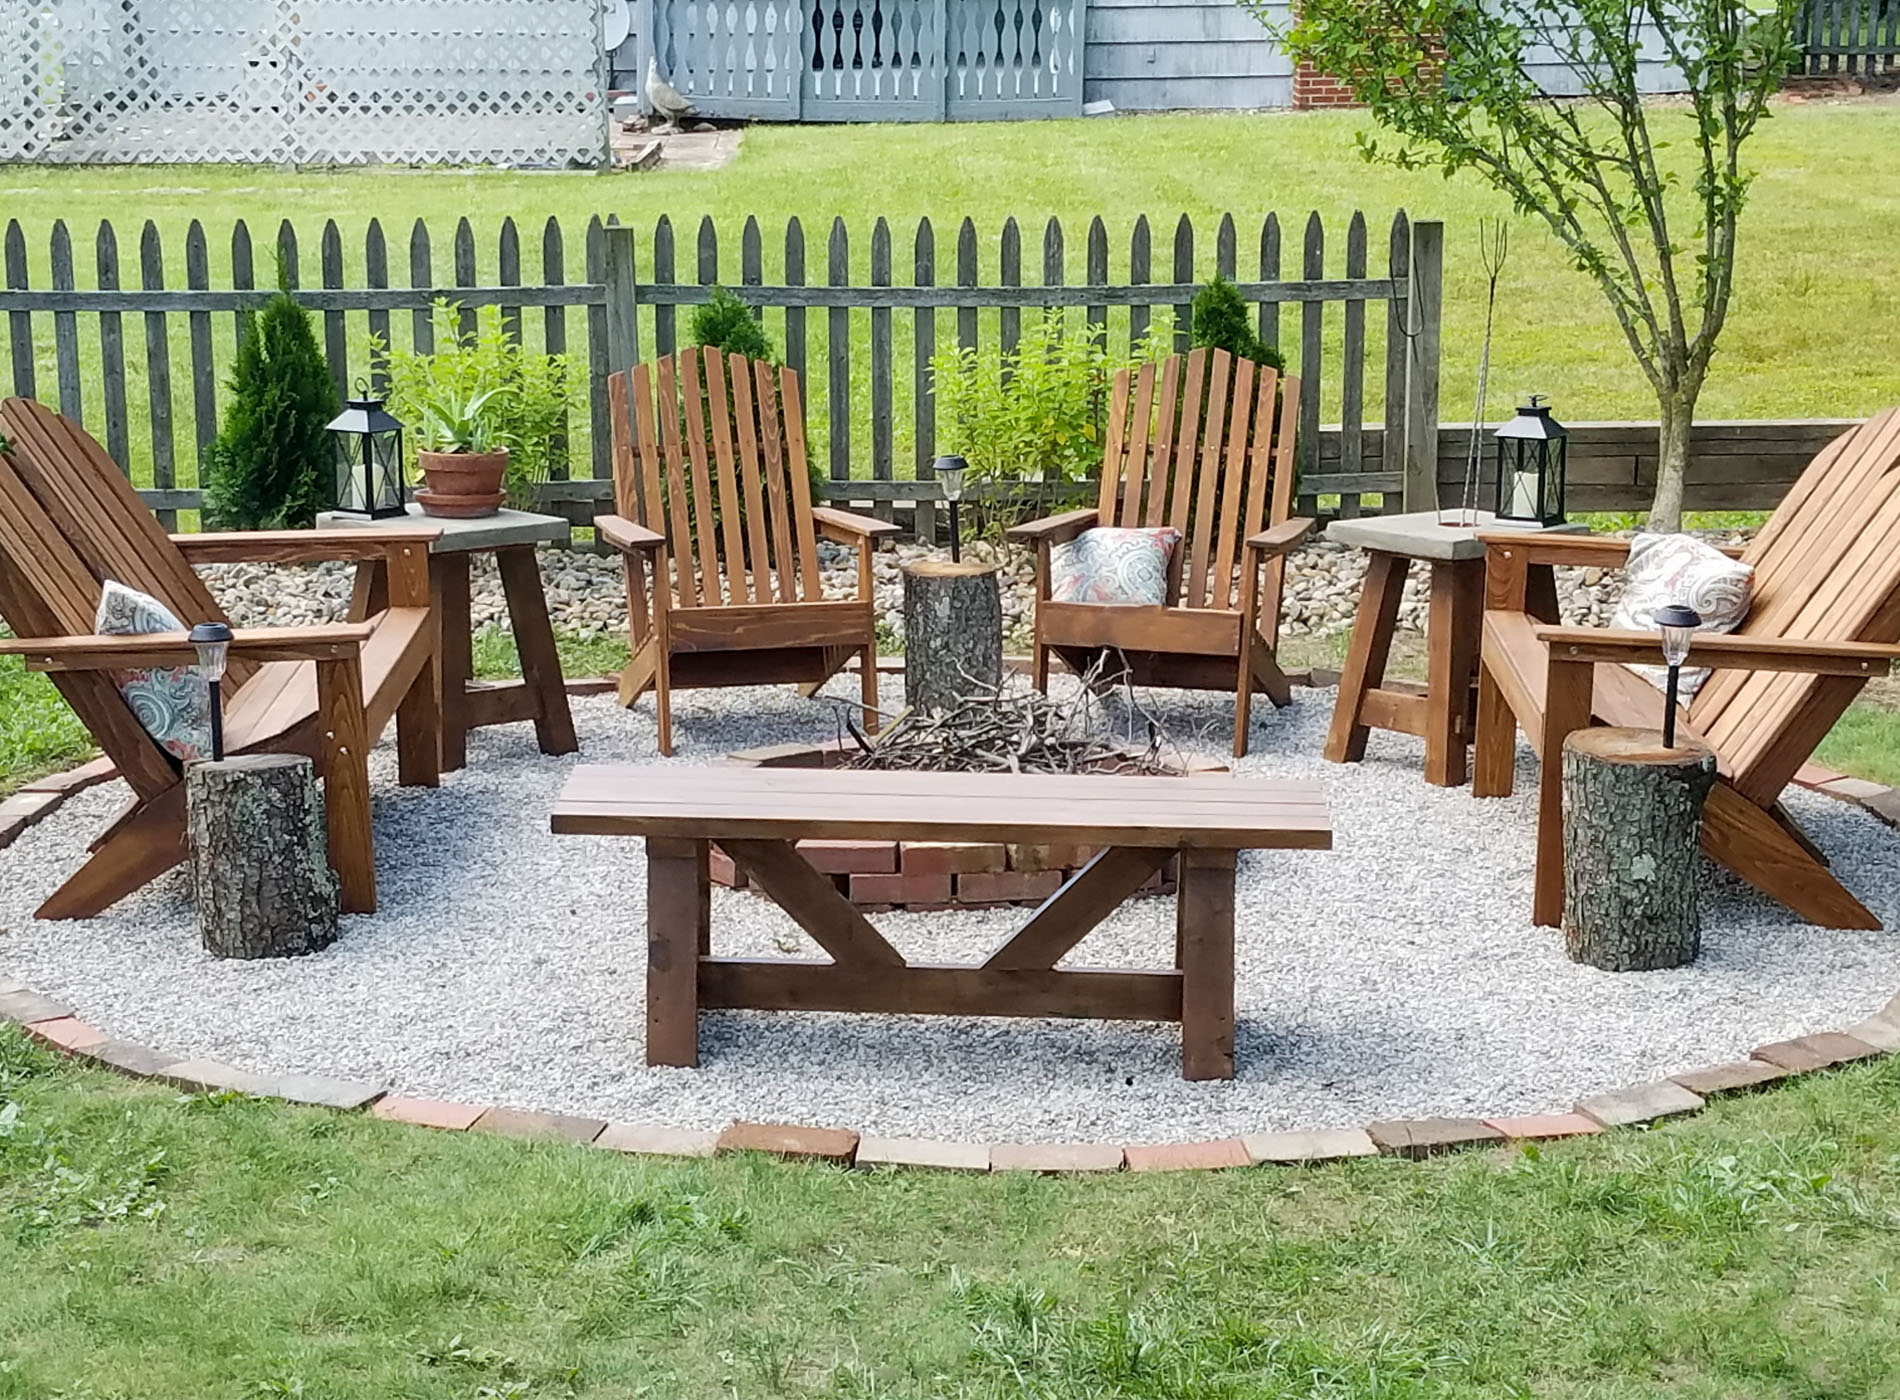 DIY Fire Pit ~ Backyard Budget Decor - Prodigal Pieces on Backyard Fire Pit Ideas Diy id=32994